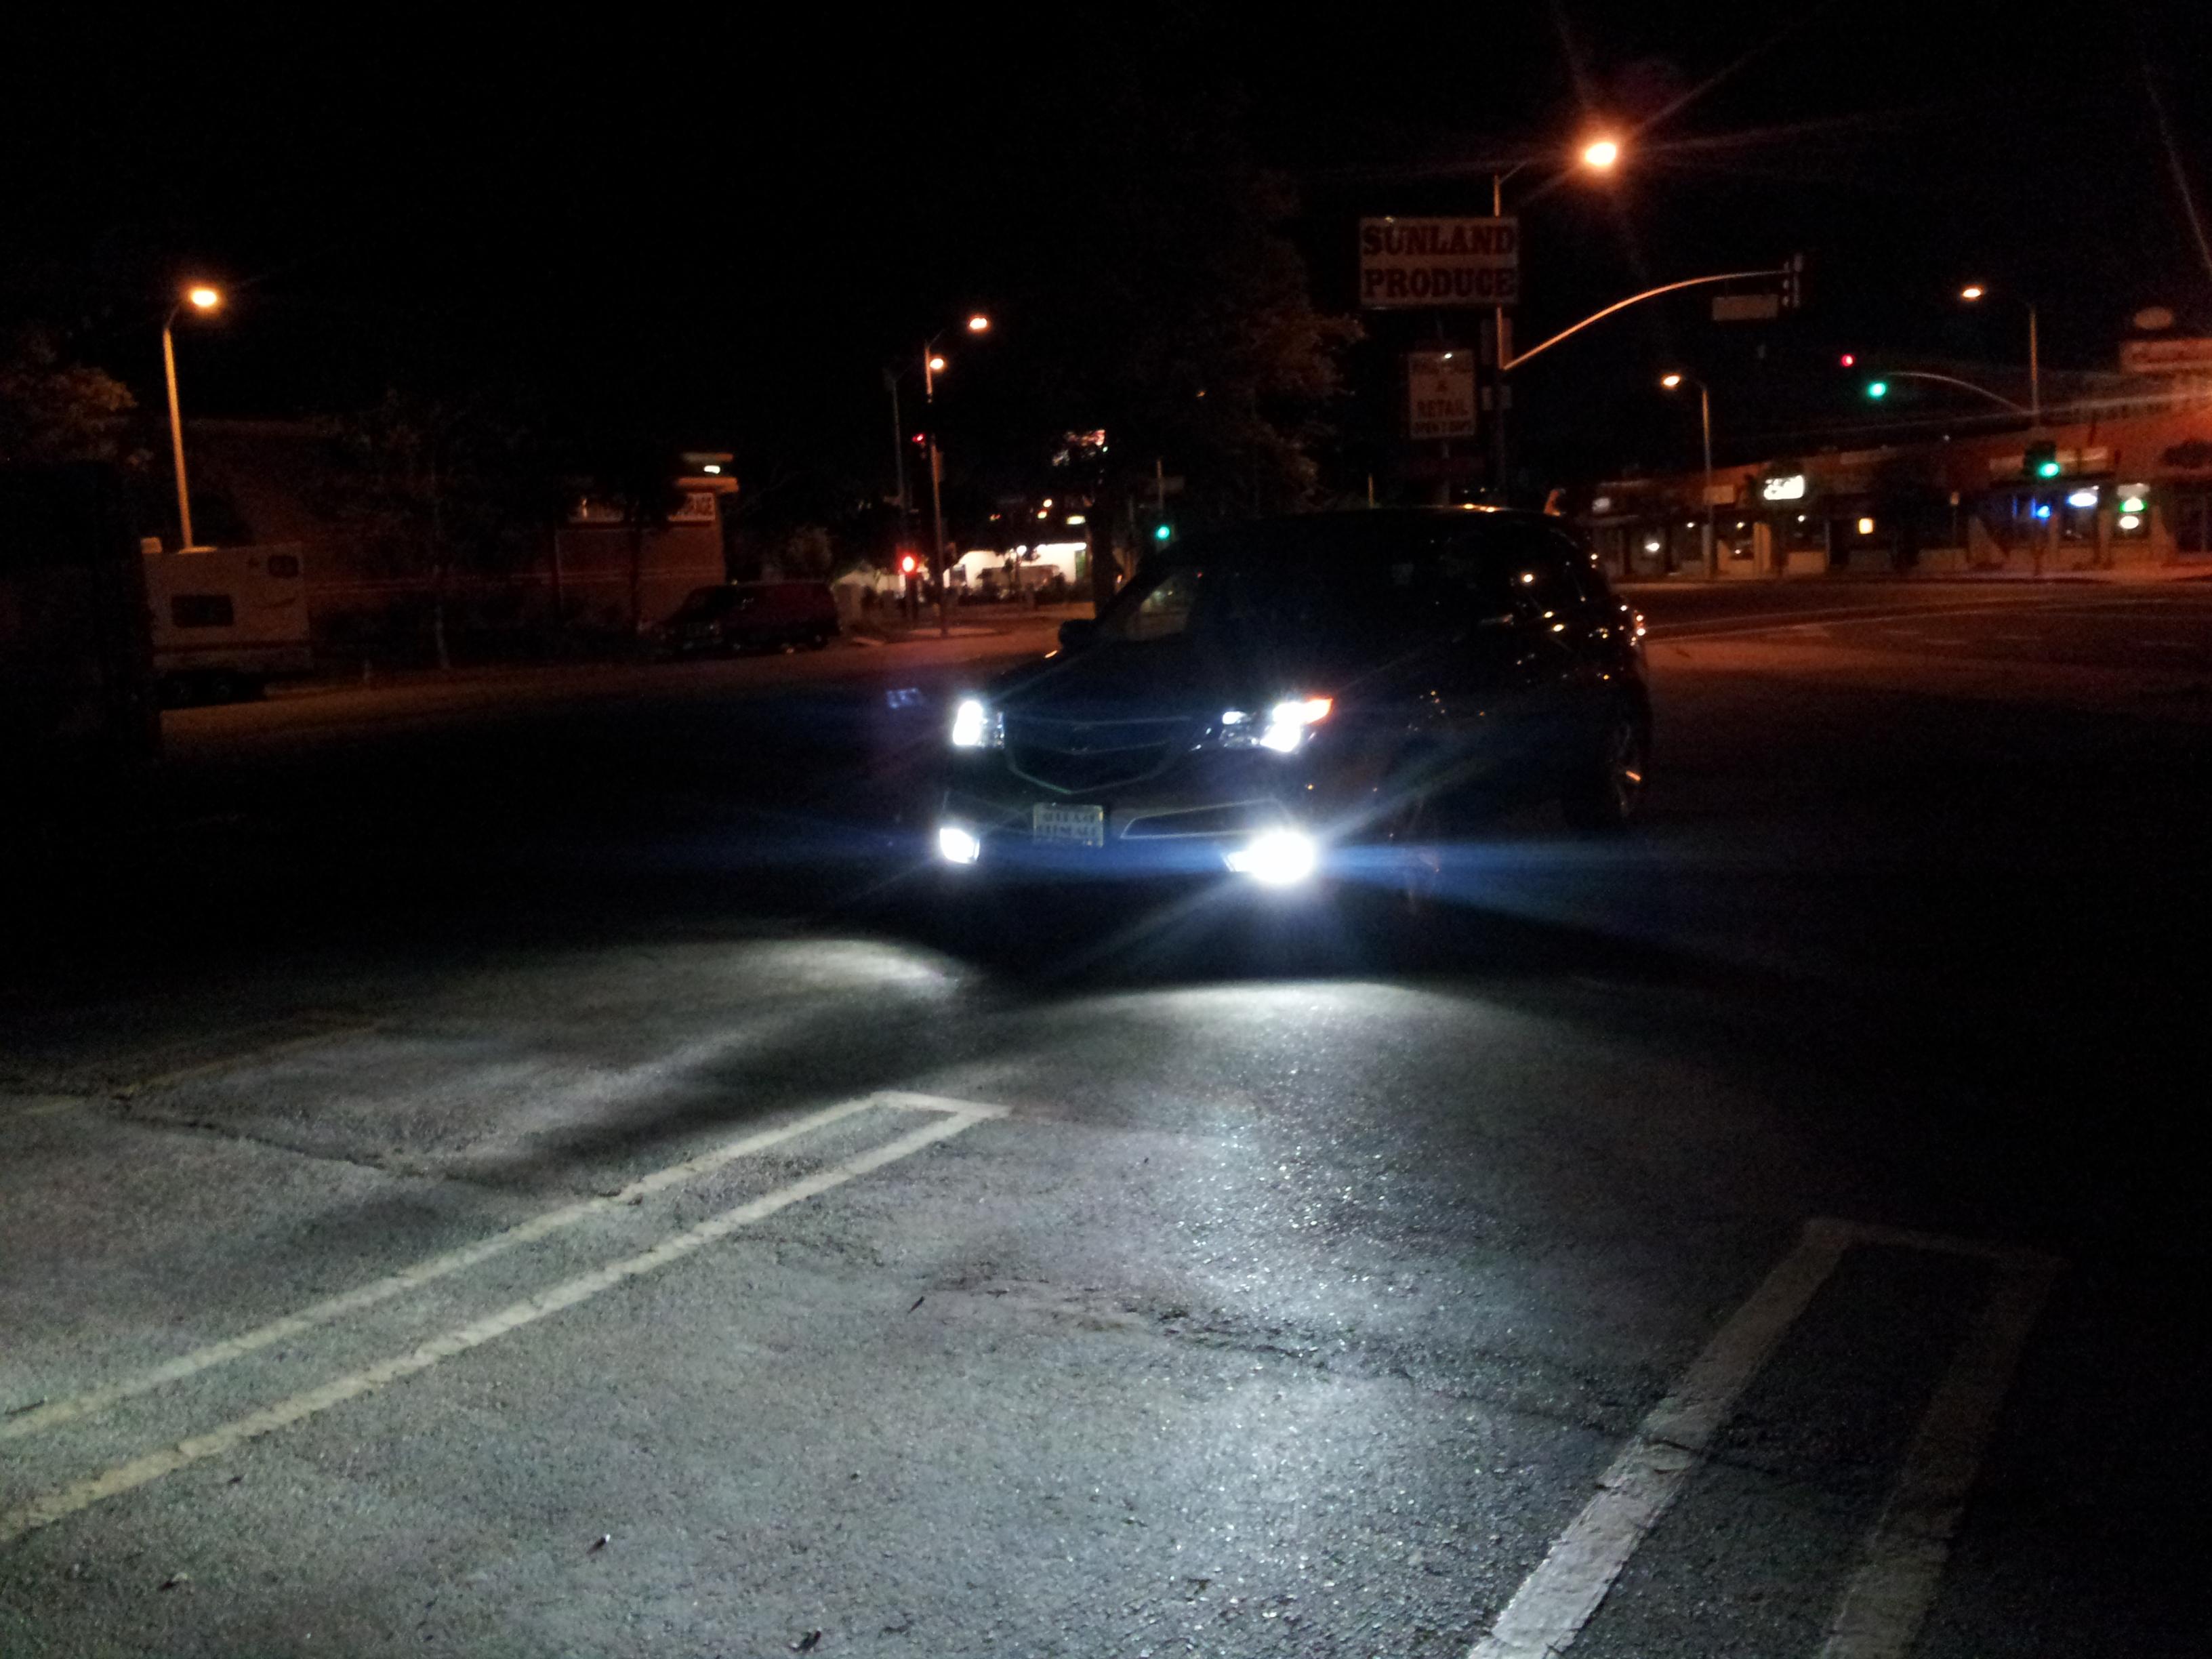 HID Fog/LED DRL Installed - PICS-20121025_214031.jpg